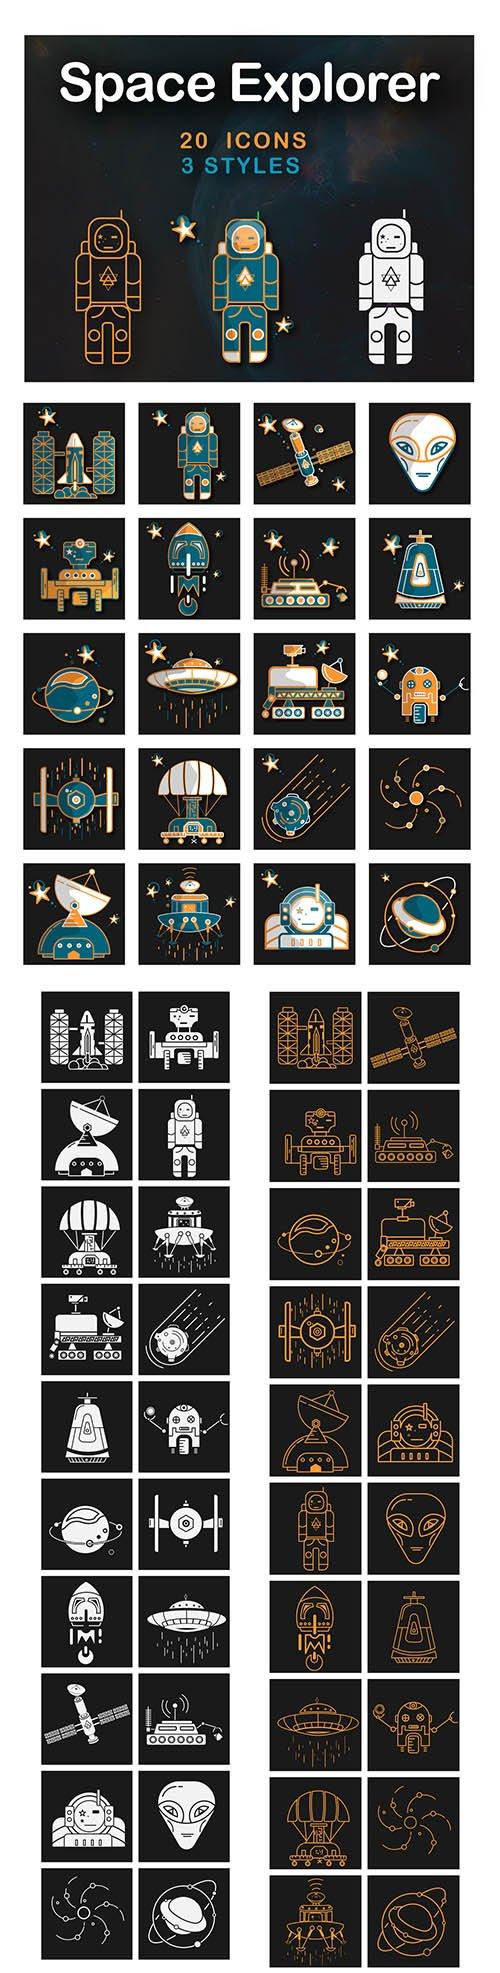 Space Explorer Icons